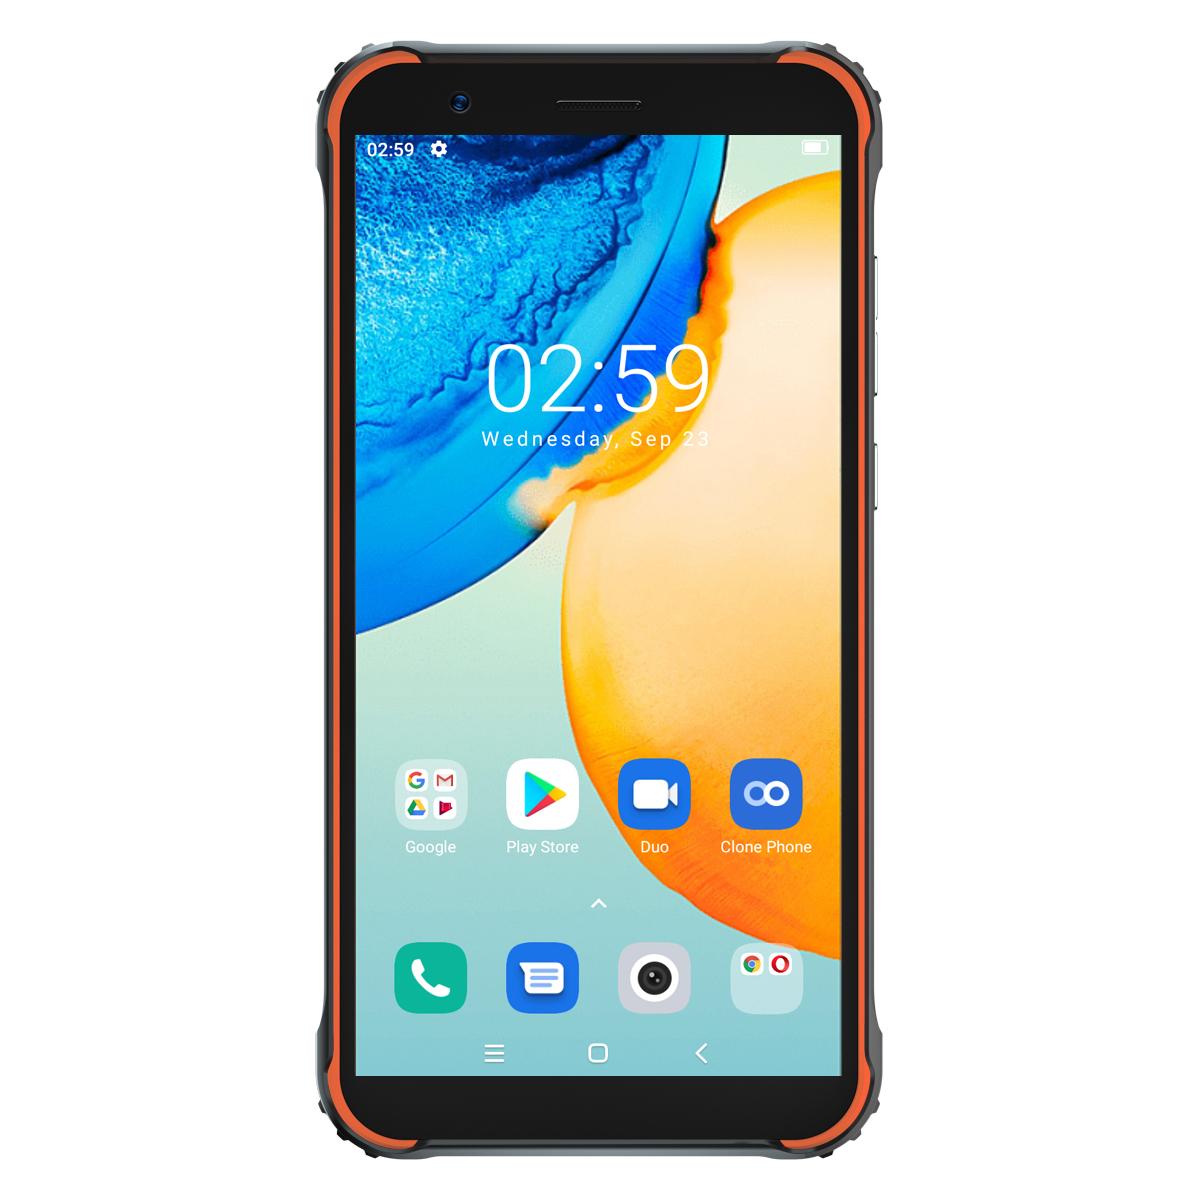 Blackview BV4900 Pro Global Version IP68&IP69k Waterproof 5.7 inch NFC Android 10 5580mAh 4GB 64GB Helio P22 Octa Core 4G Rugged Smartphone